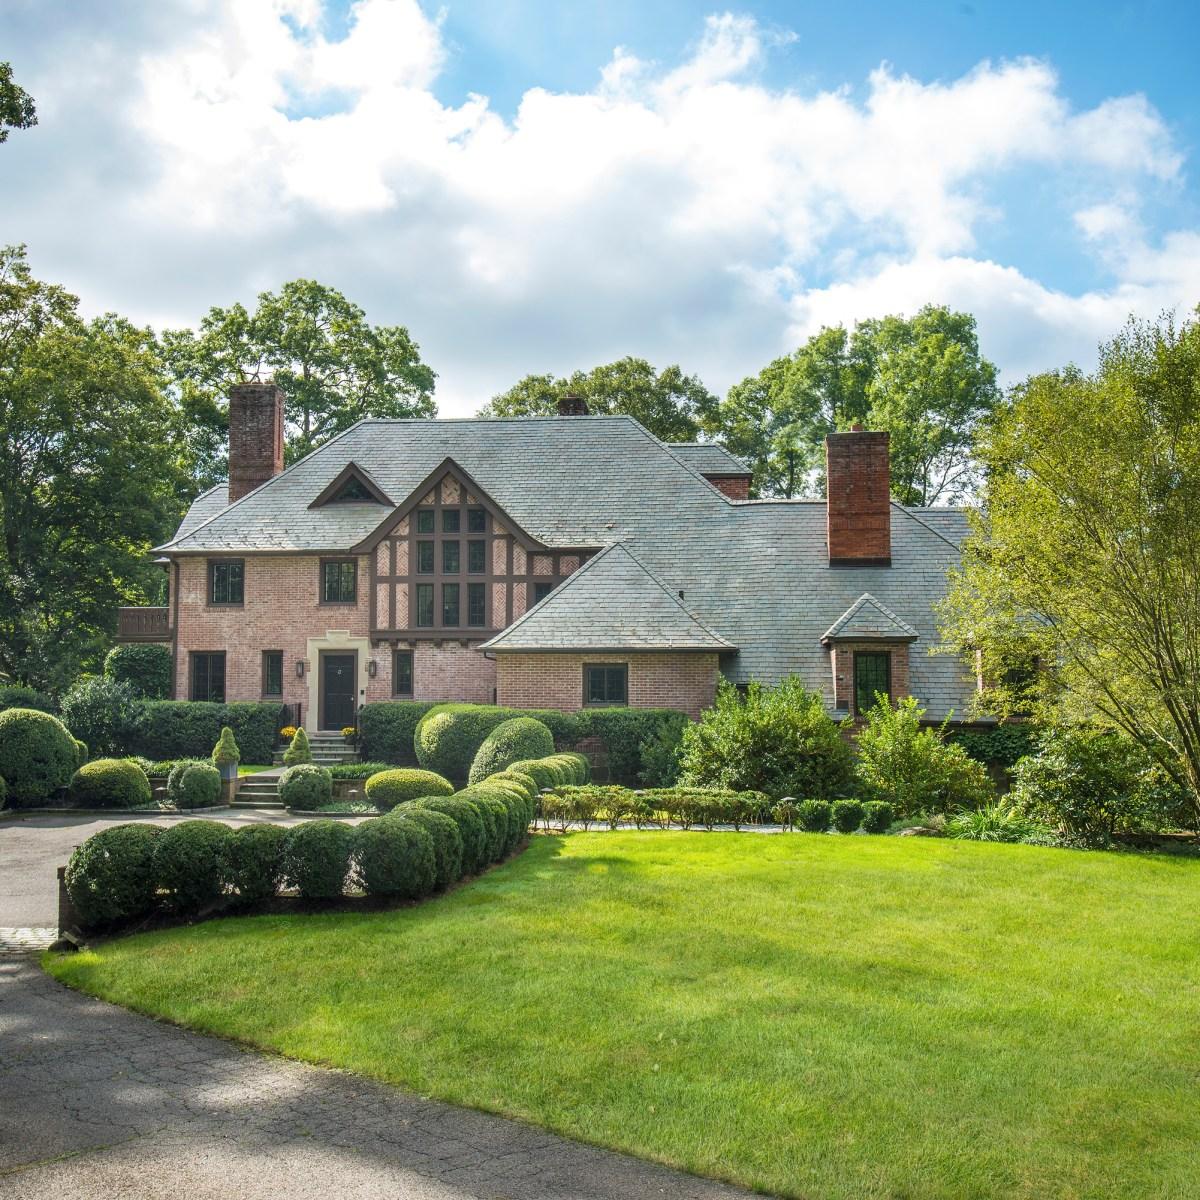 Mary-Stuart Freydberg lists Boxwood Court 138 Pecksland Rd Greenwich, CT